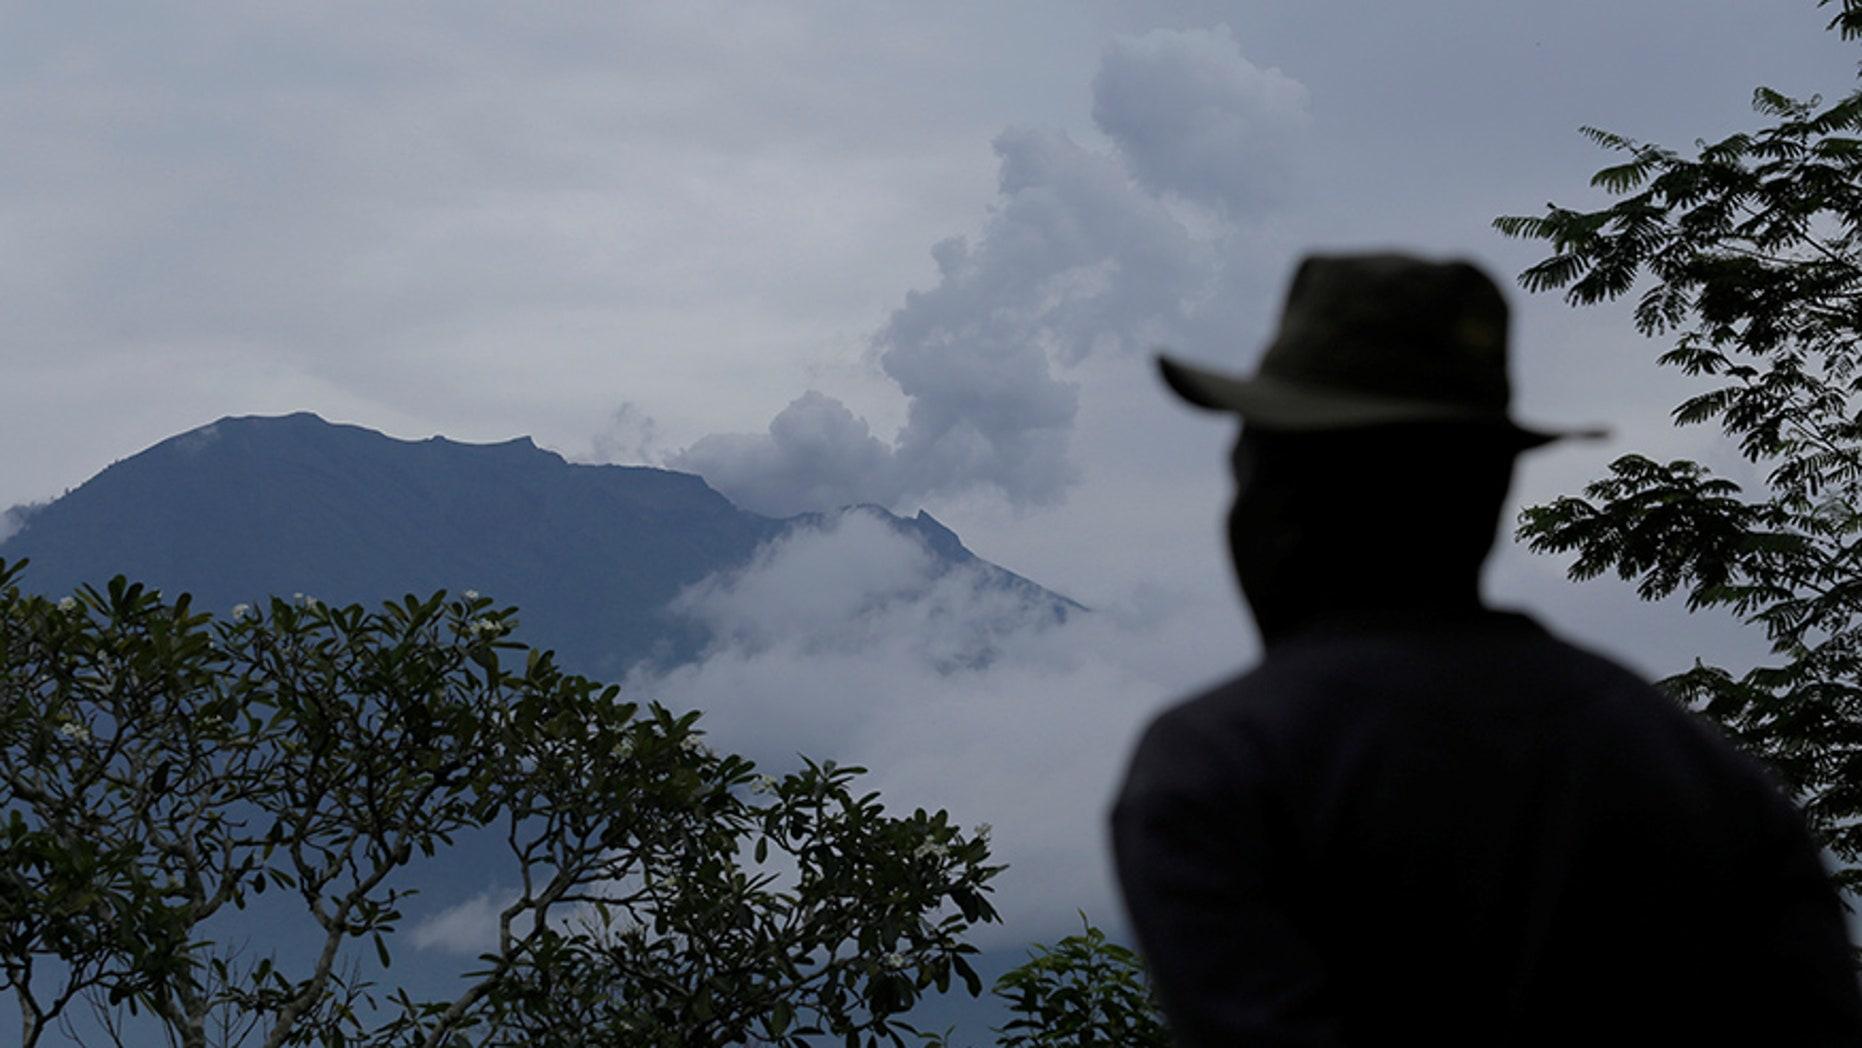 A villager looks at Mount Agung following a phreatic eruption in Rendang Village, Karangasem, Bali, Indonesia November 22, 2017. REUTERS/Johannes P. Christo - RC1EAAA81560